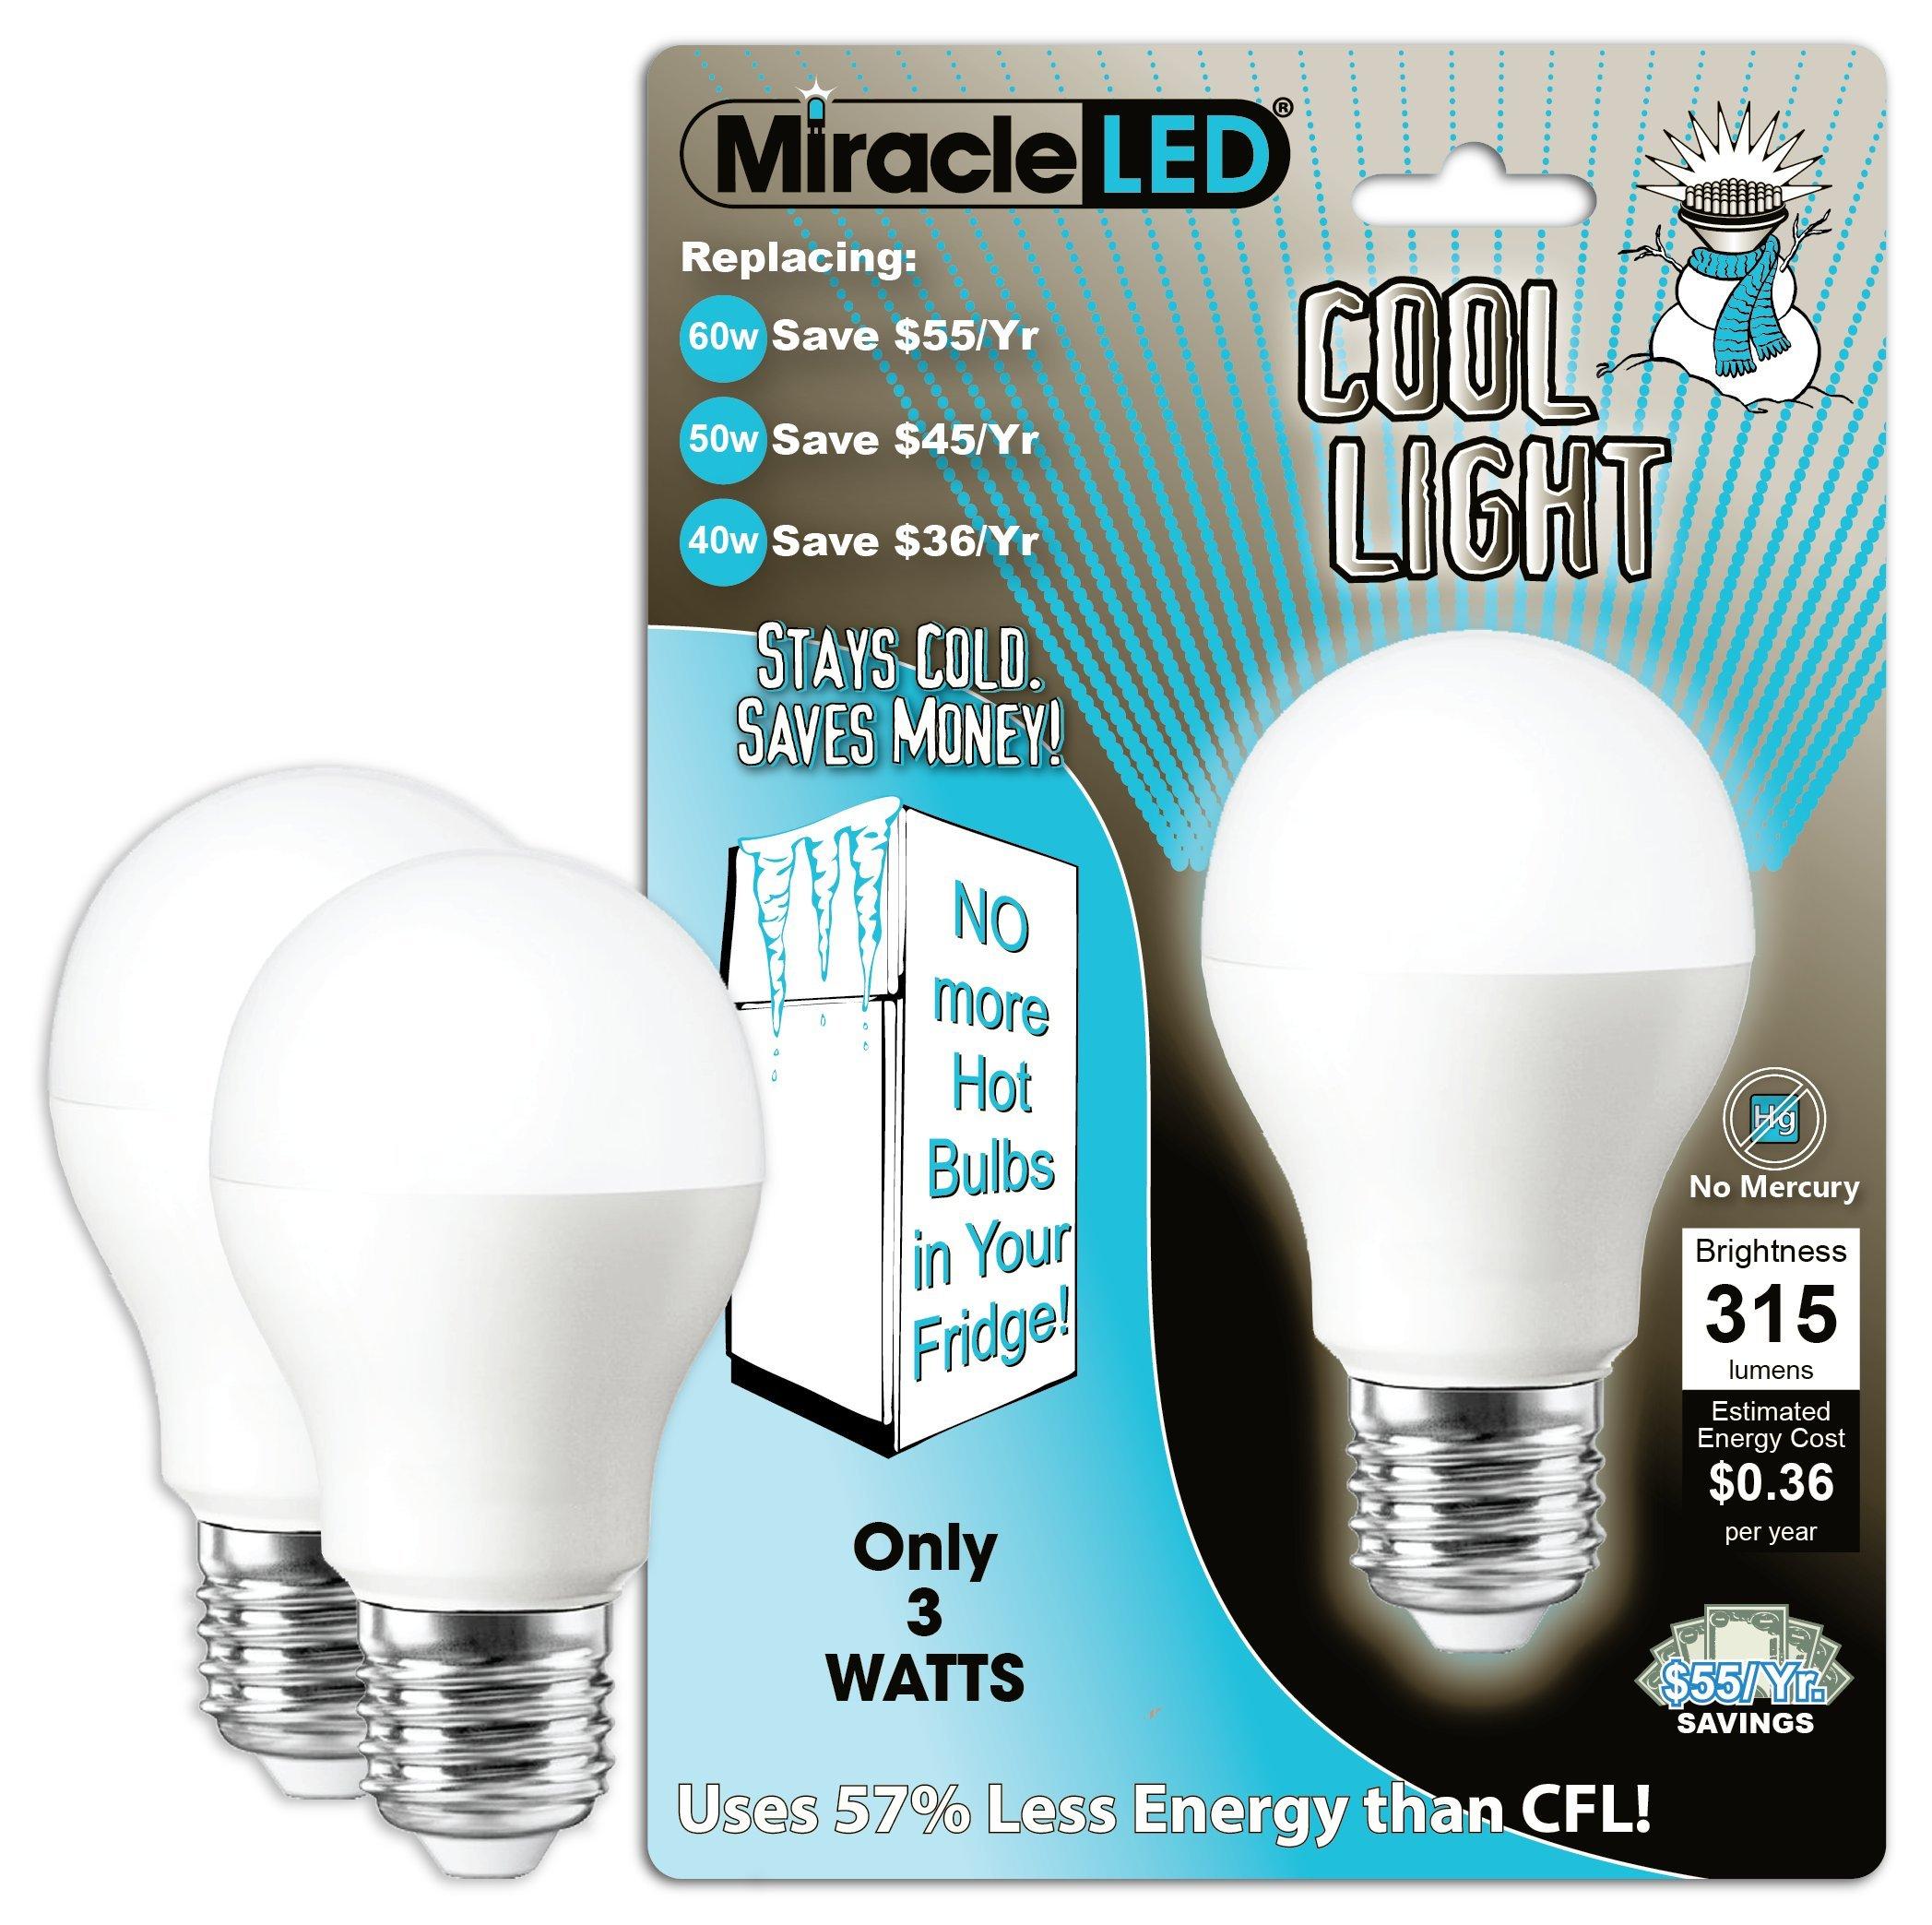 Miracle LED 604724 3-watt Refrigerator and Freezer Light, Long Life Energy Saver Bulb, Cool White, 2-Pack